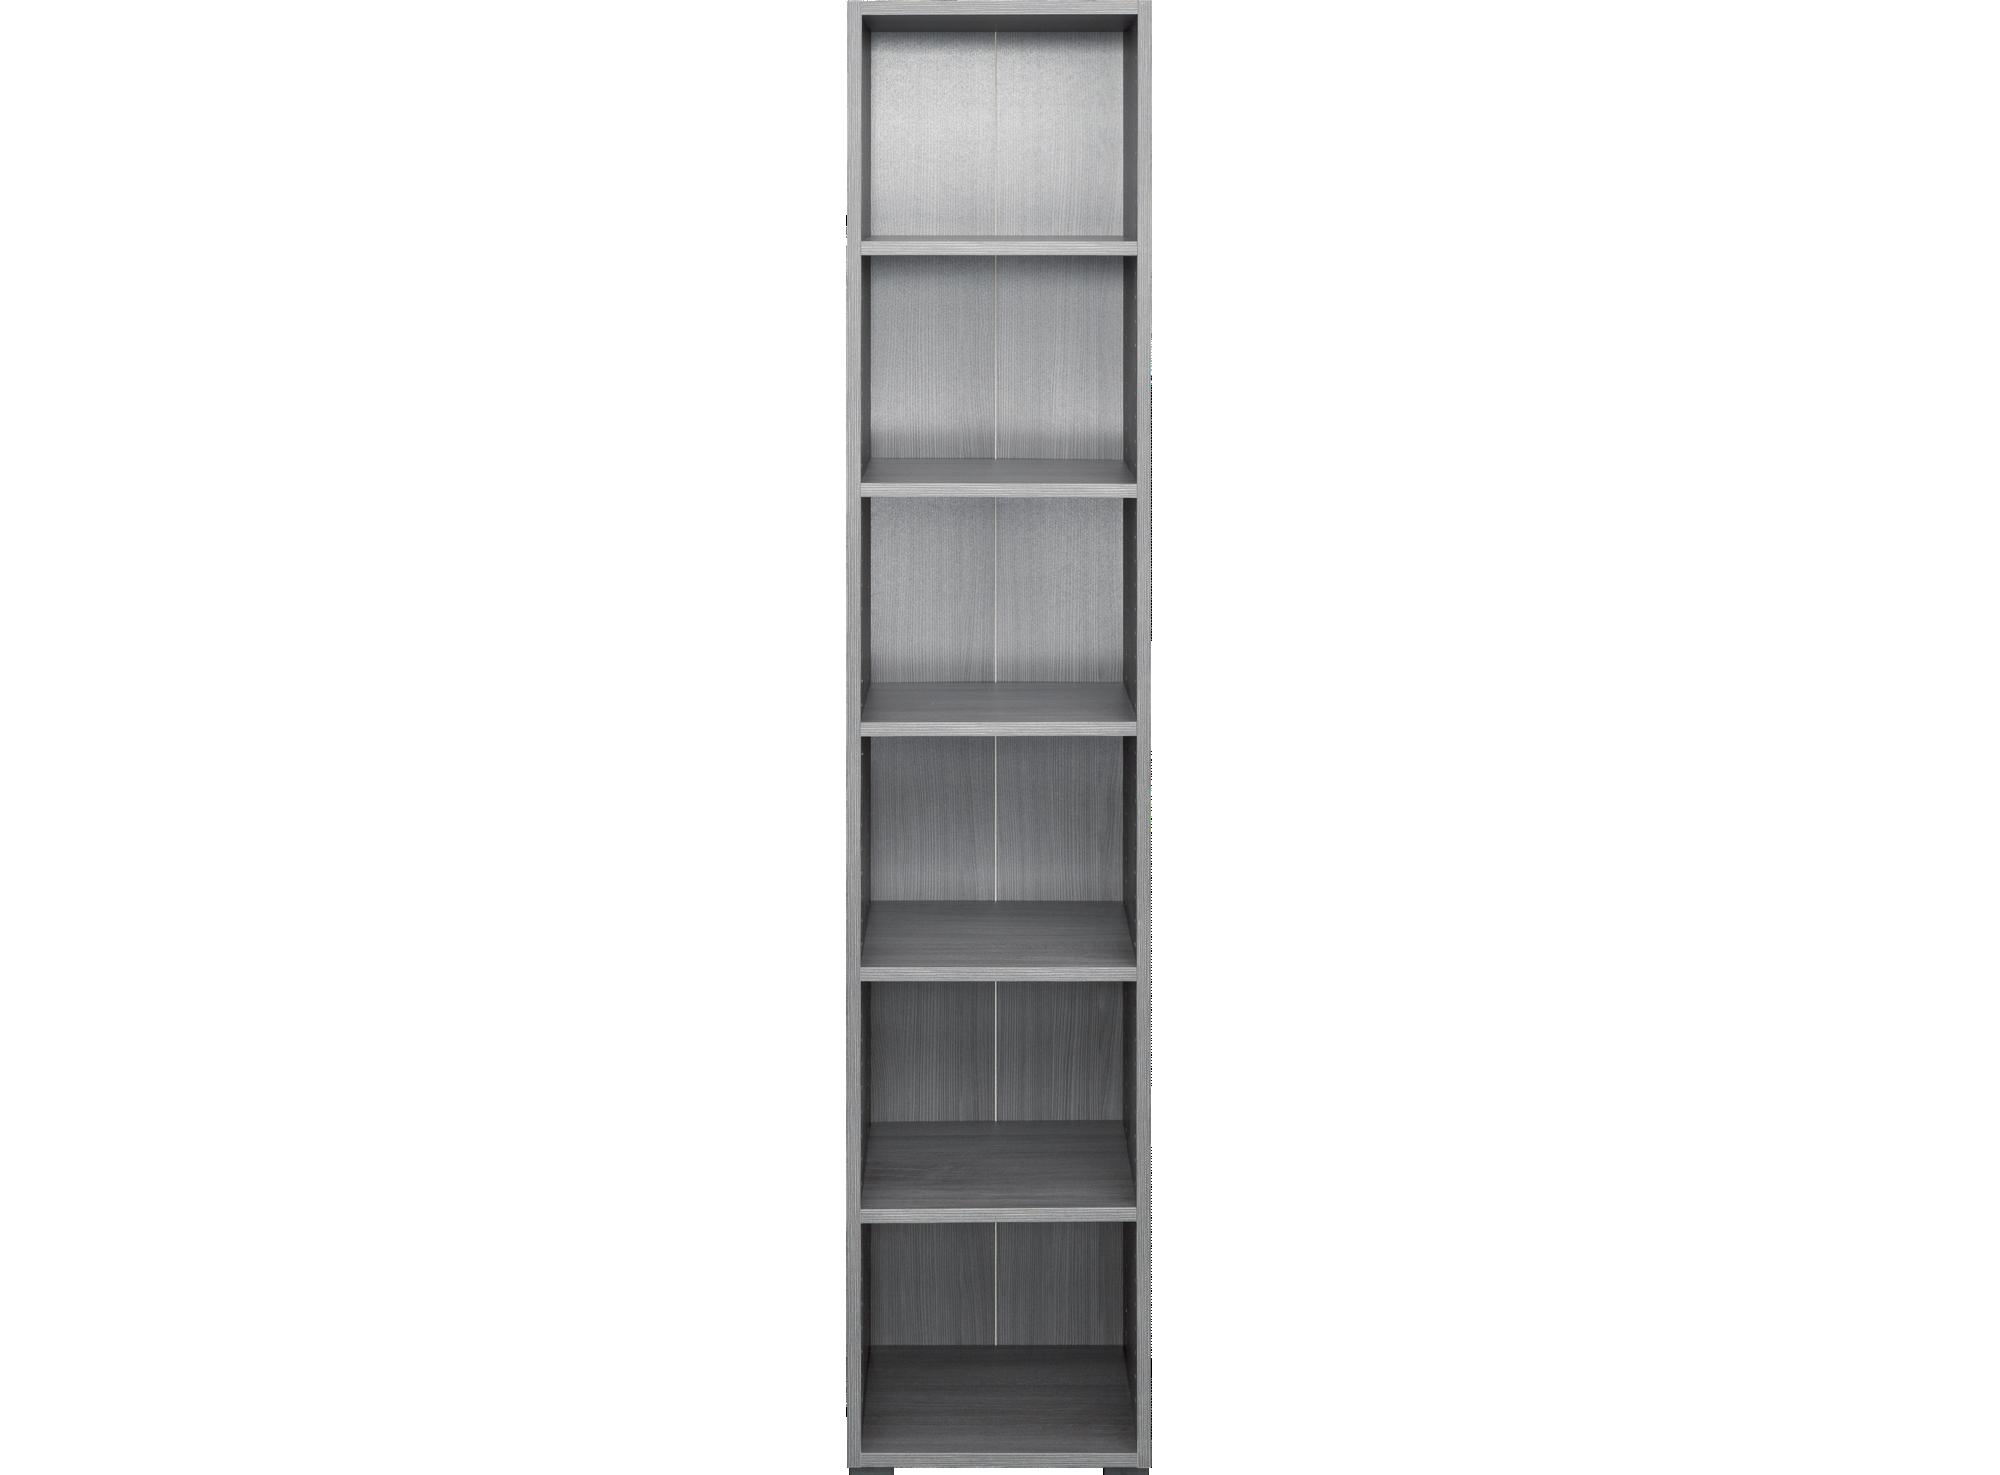 bibliotheque 40x196x36 cm chene argente biblioth que. Black Bedroom Furniture Sets. Home Design Ideas